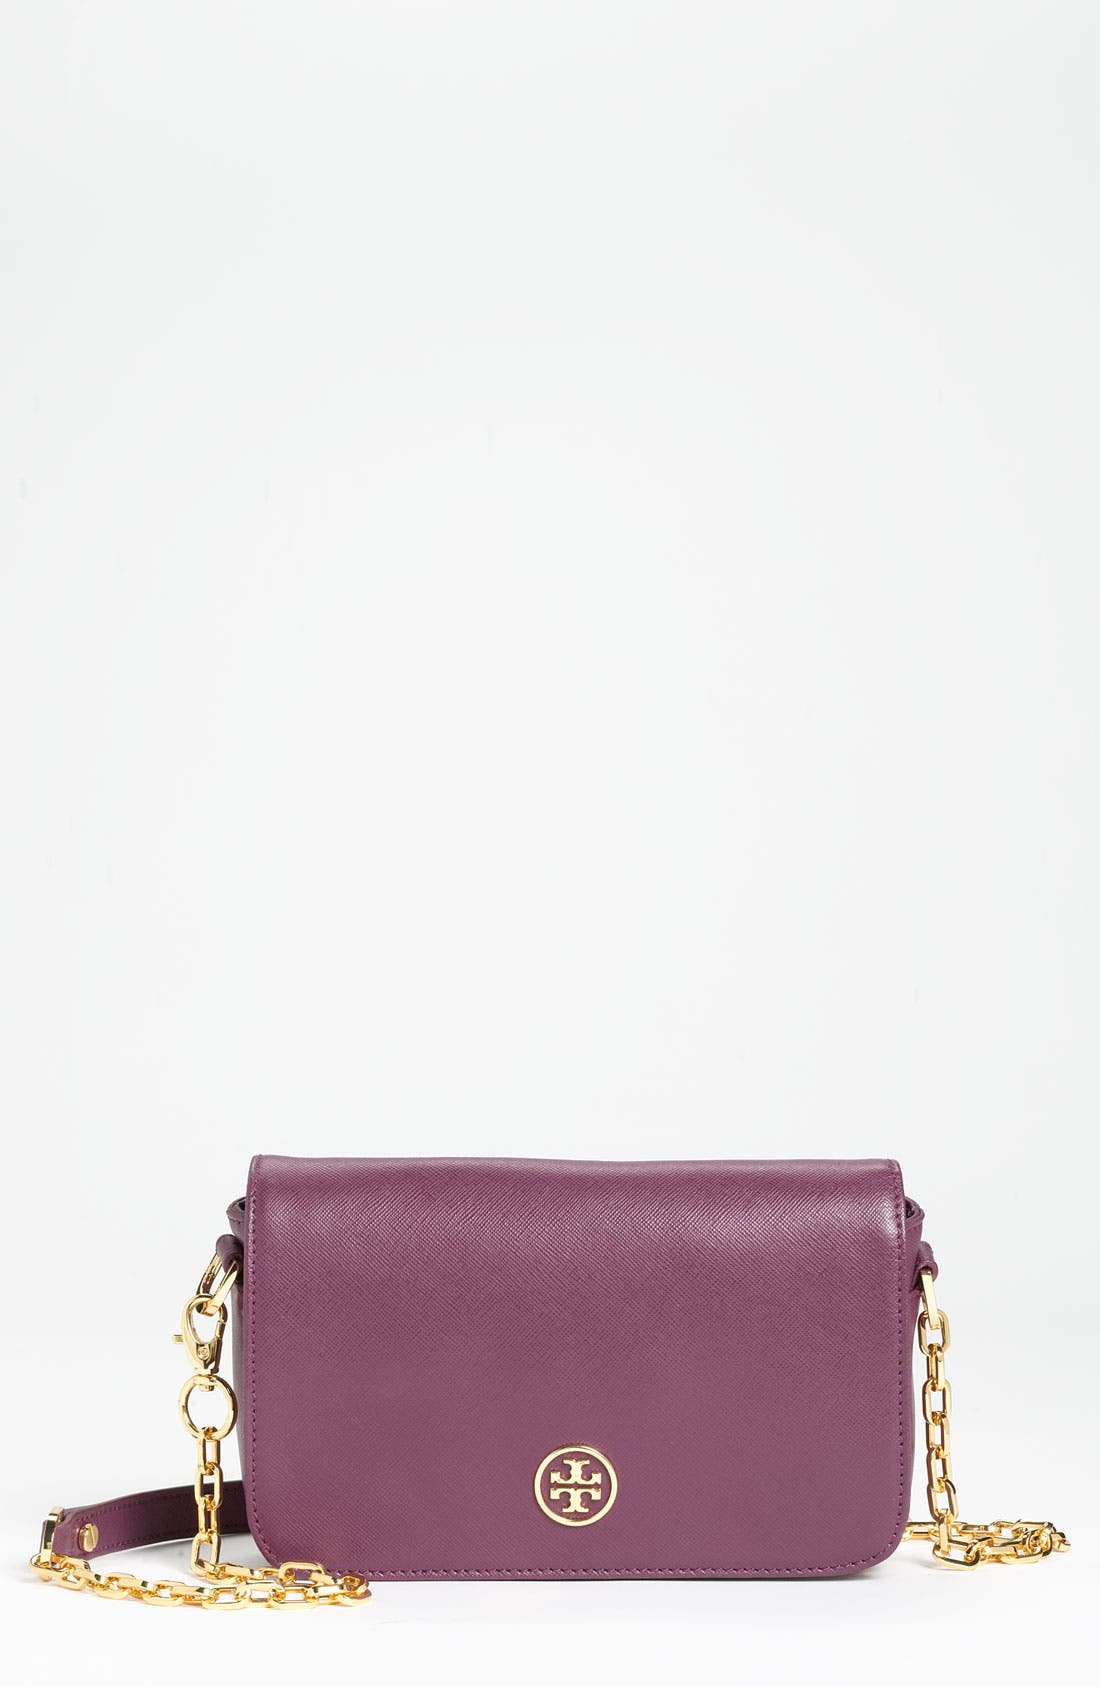 Main Image - Tory Burch 'Robinson - Mini' Bag